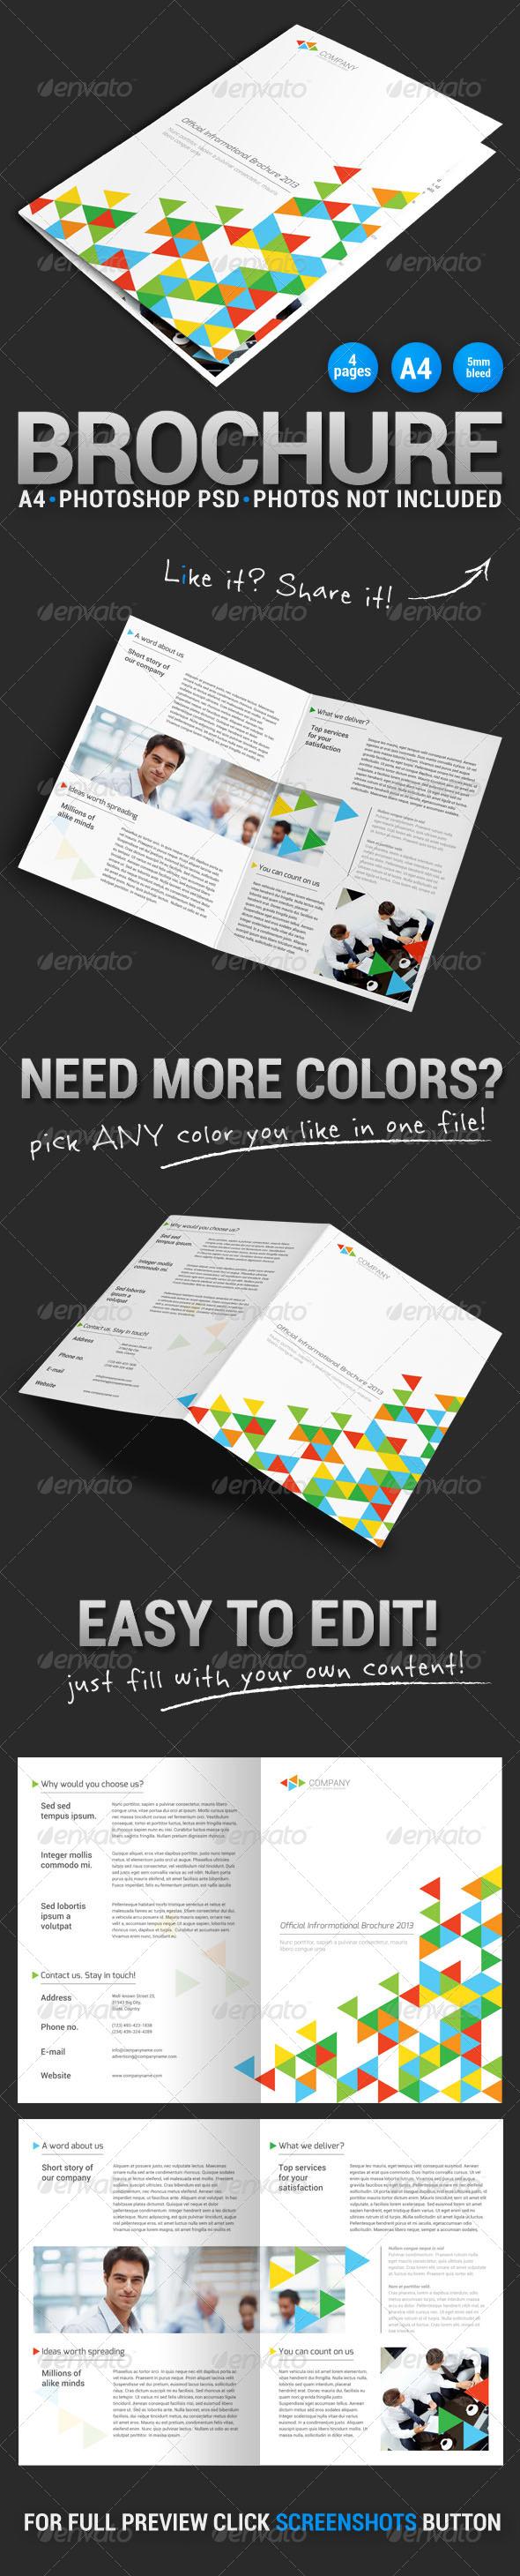 GraphicRiver Bi-fold Brochure 3 5326111